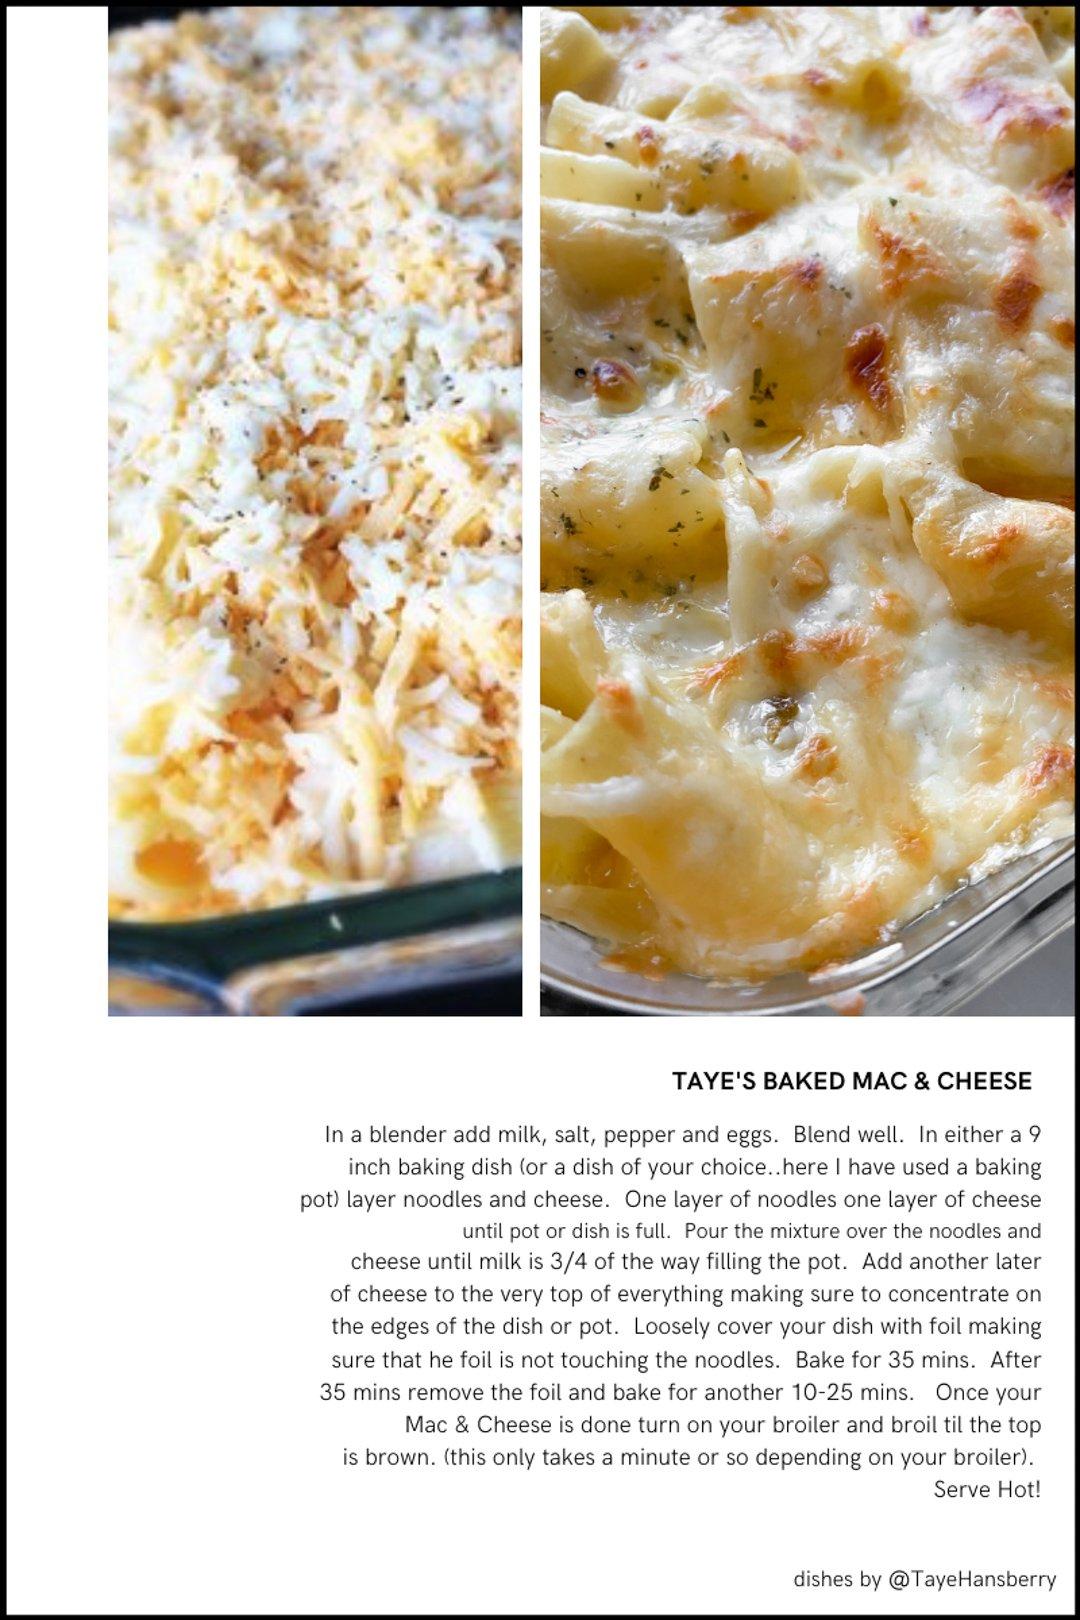 TAYE HANSBERRY'S baked mac and cheese recipe